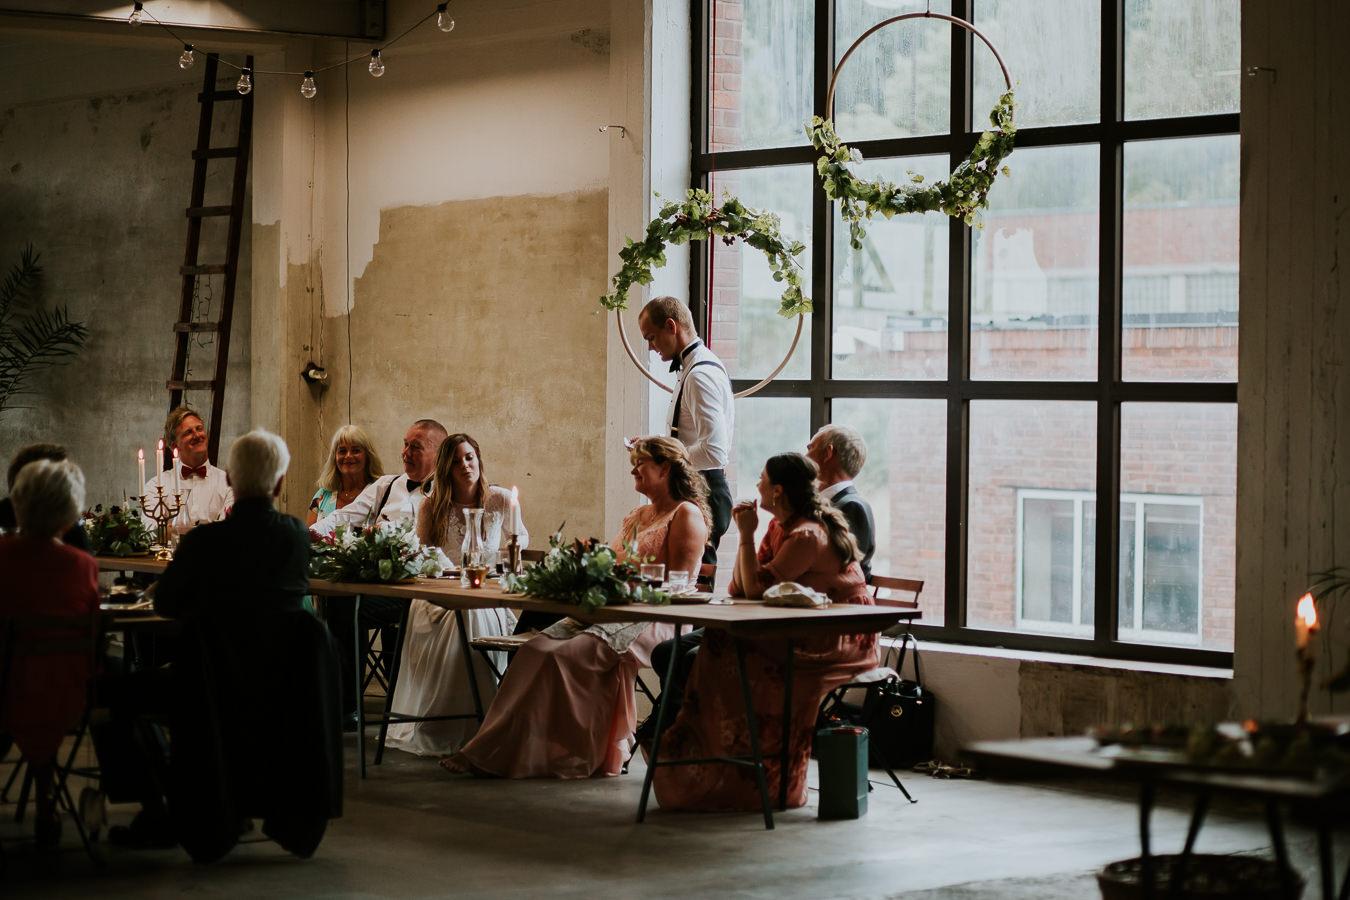 Bryllup-Lageret-Tofte-bryllupsfotograf-166.jpg